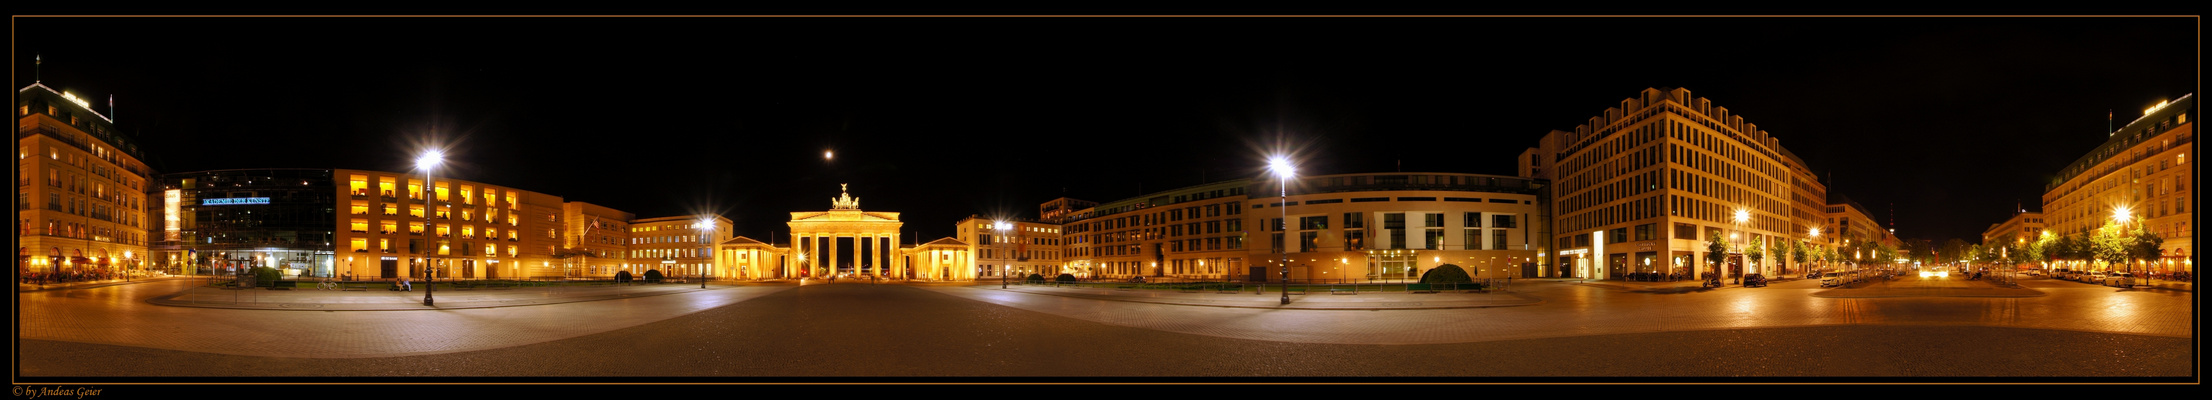 Berlin - Unter den Linden, vor dem Brandenburger Tor (2D Ansicht)